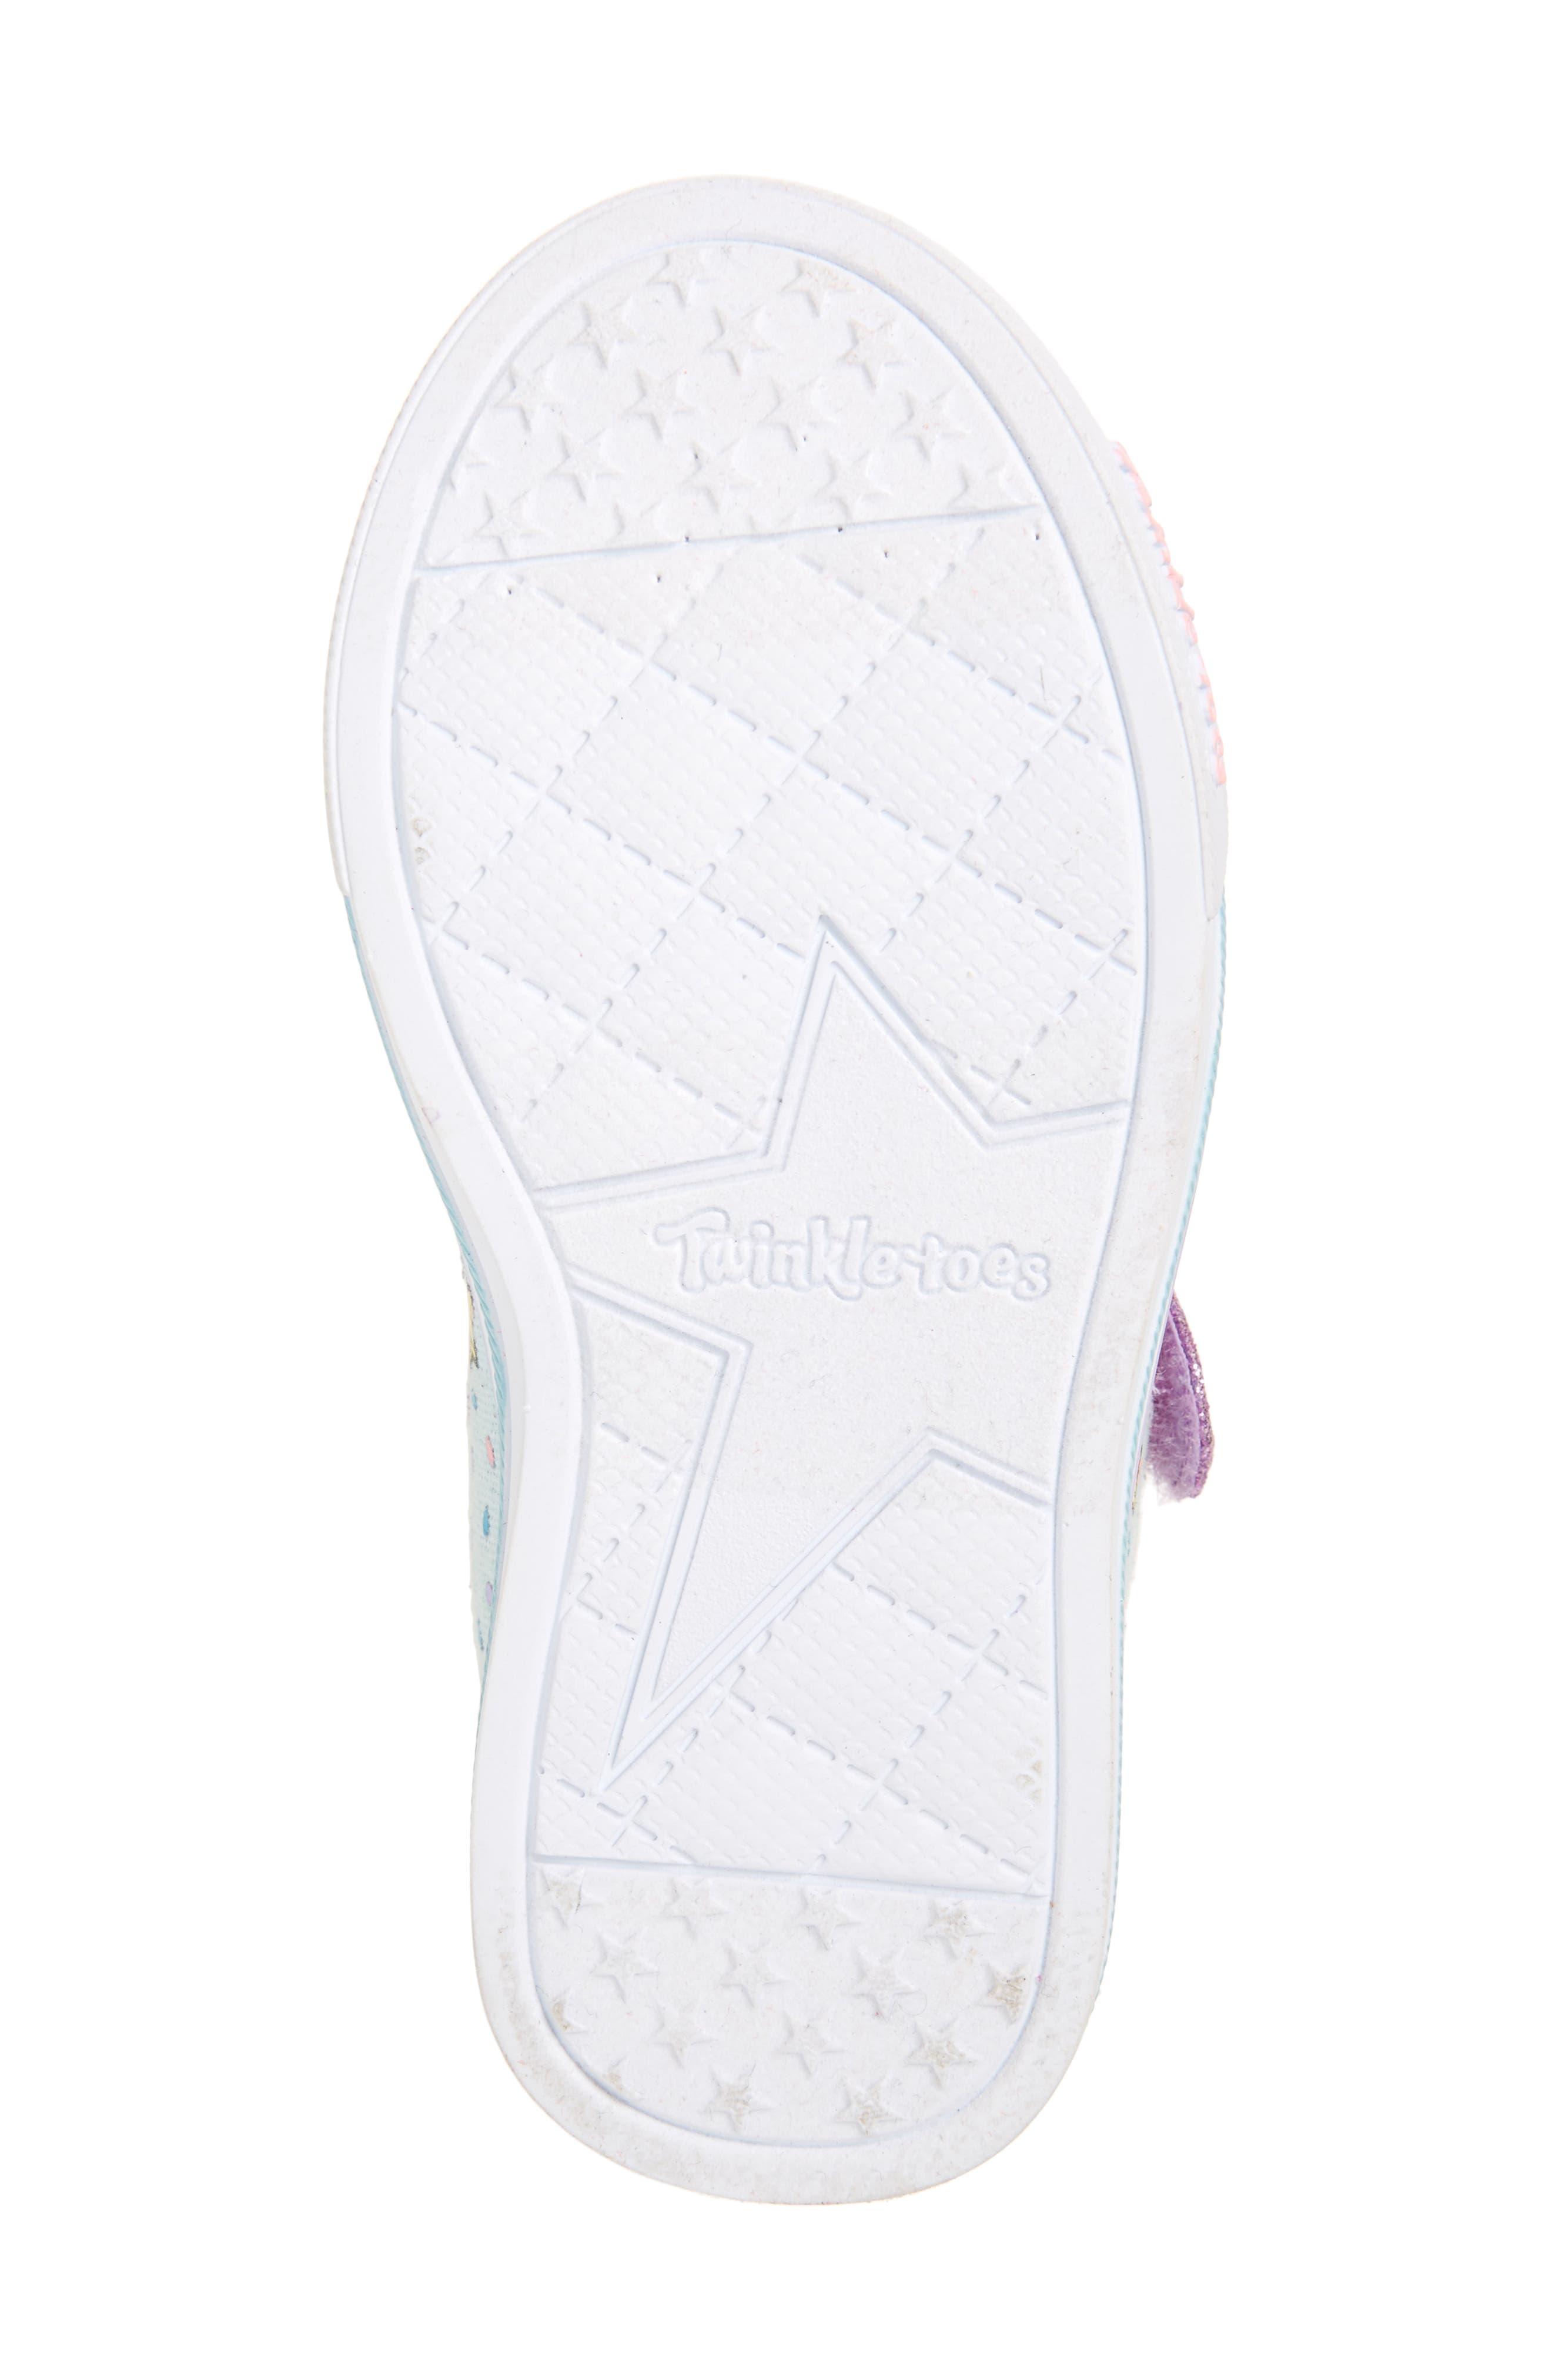 Twinkle Toes Unicorn Light-Up Sneaker,                             Alternate thumbnail 6, color,                             LIGHT BLUE/ MULTI